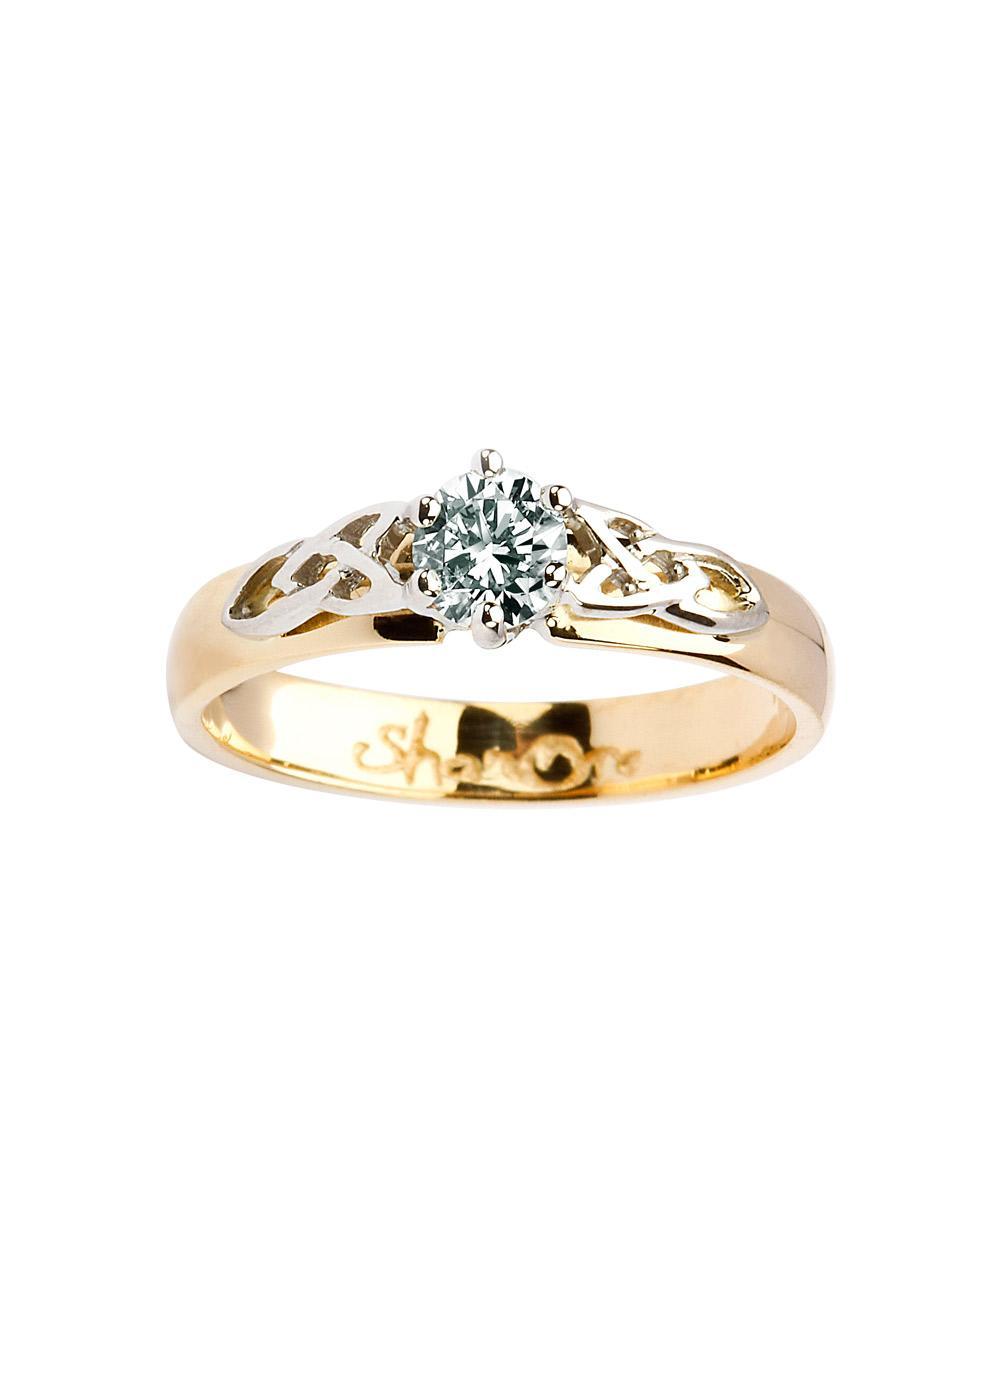 Horrible Ladies G Diamond Celtic Engagement Ring Ladies G Diamond Celtic Engagement Ring Blarney Irish Engagement Rings Settings Irish Engagement Rings wedding rings Irish Engagement Rings